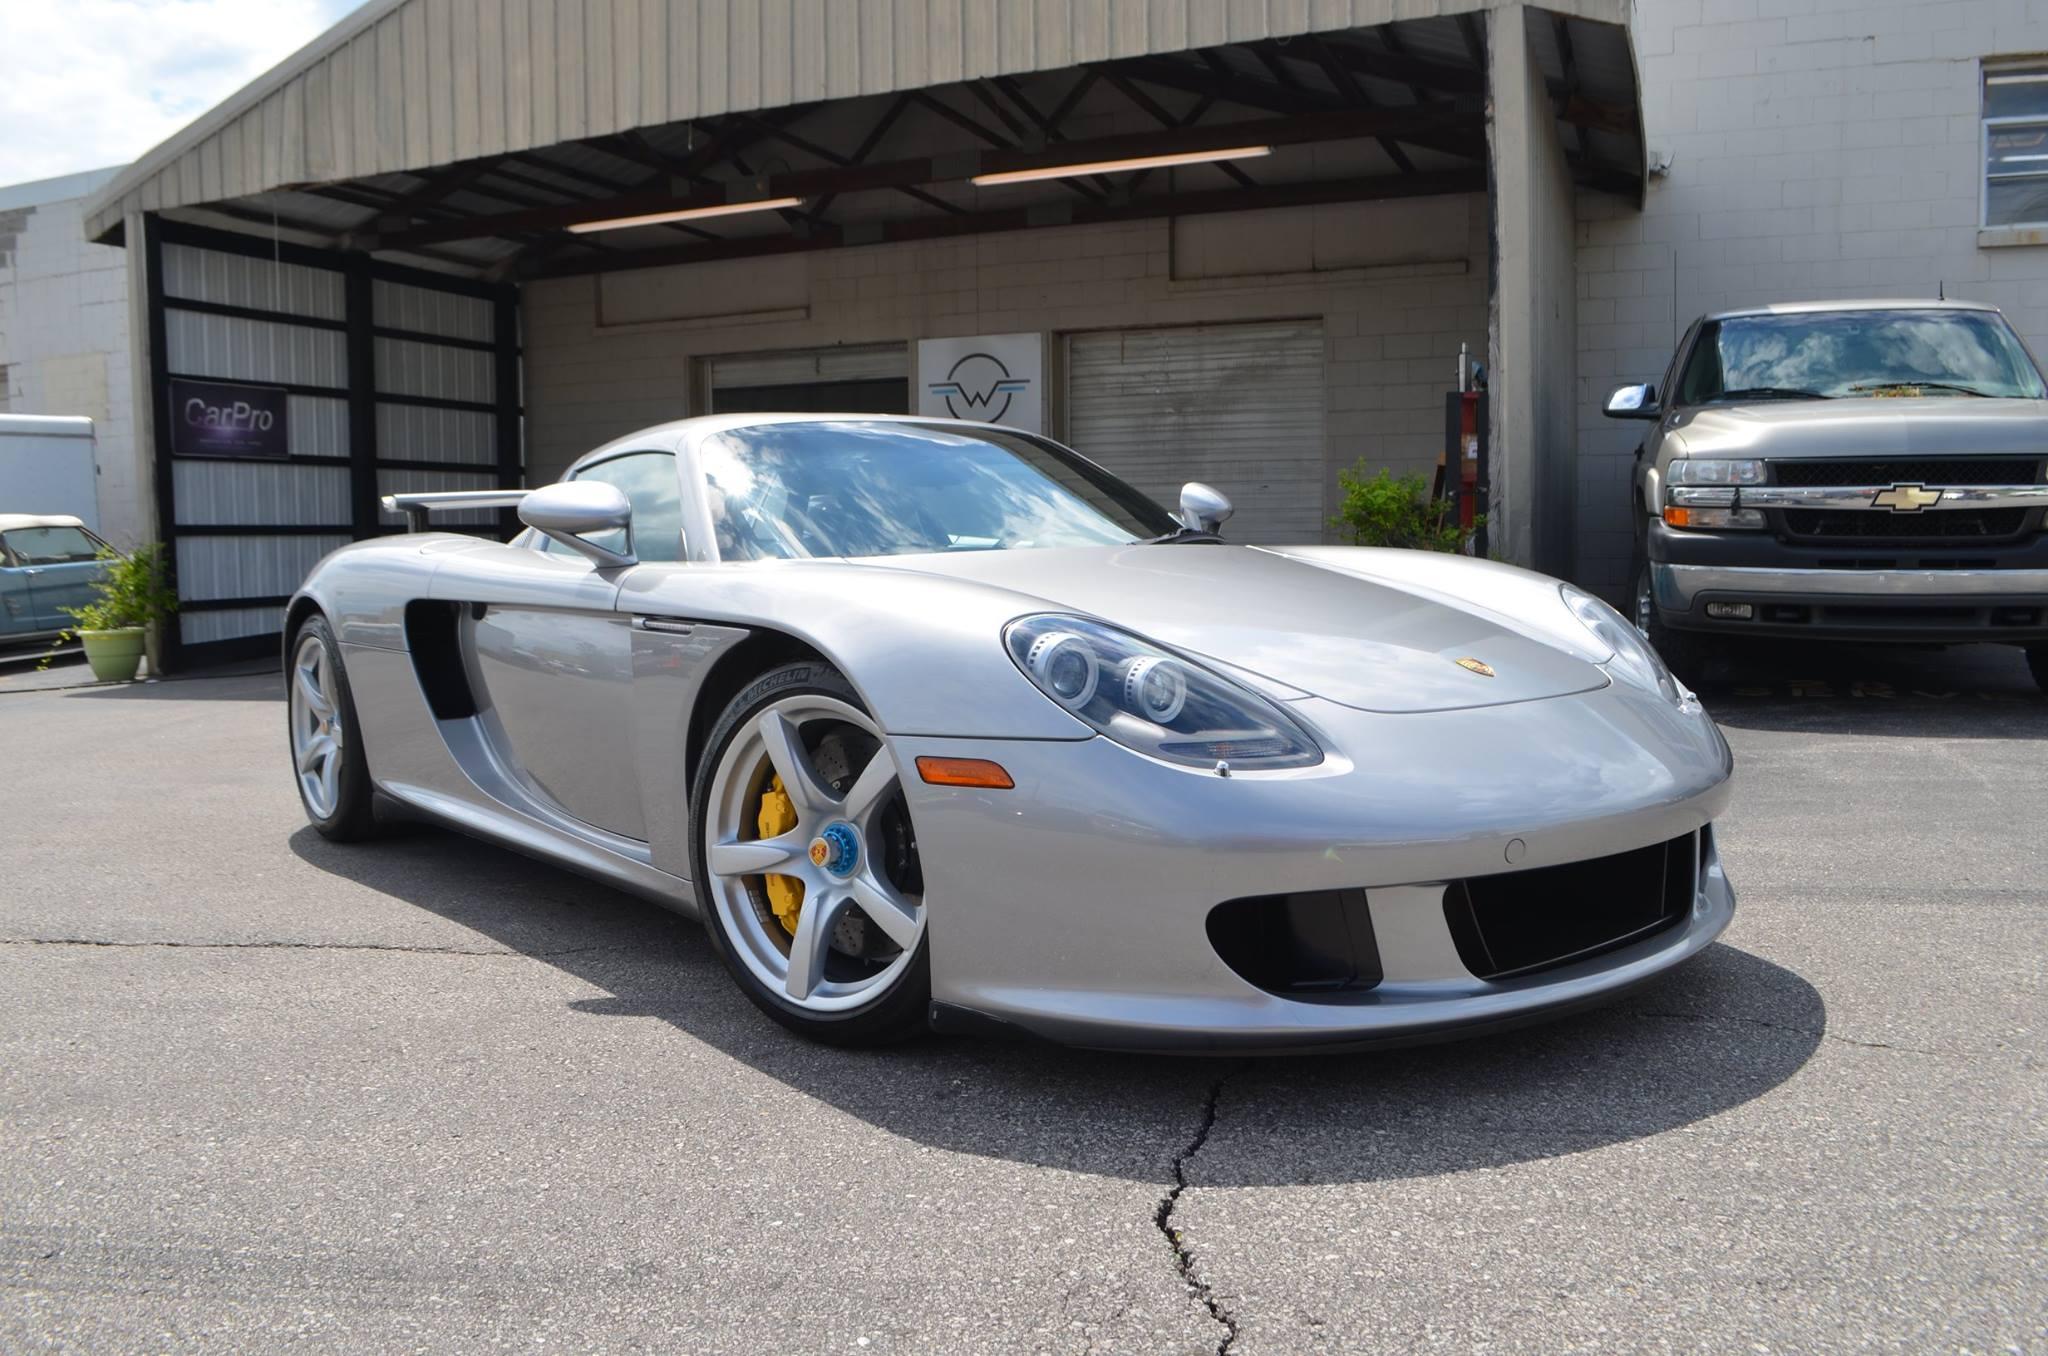 Porsche Carrera GT: Full Body PPF